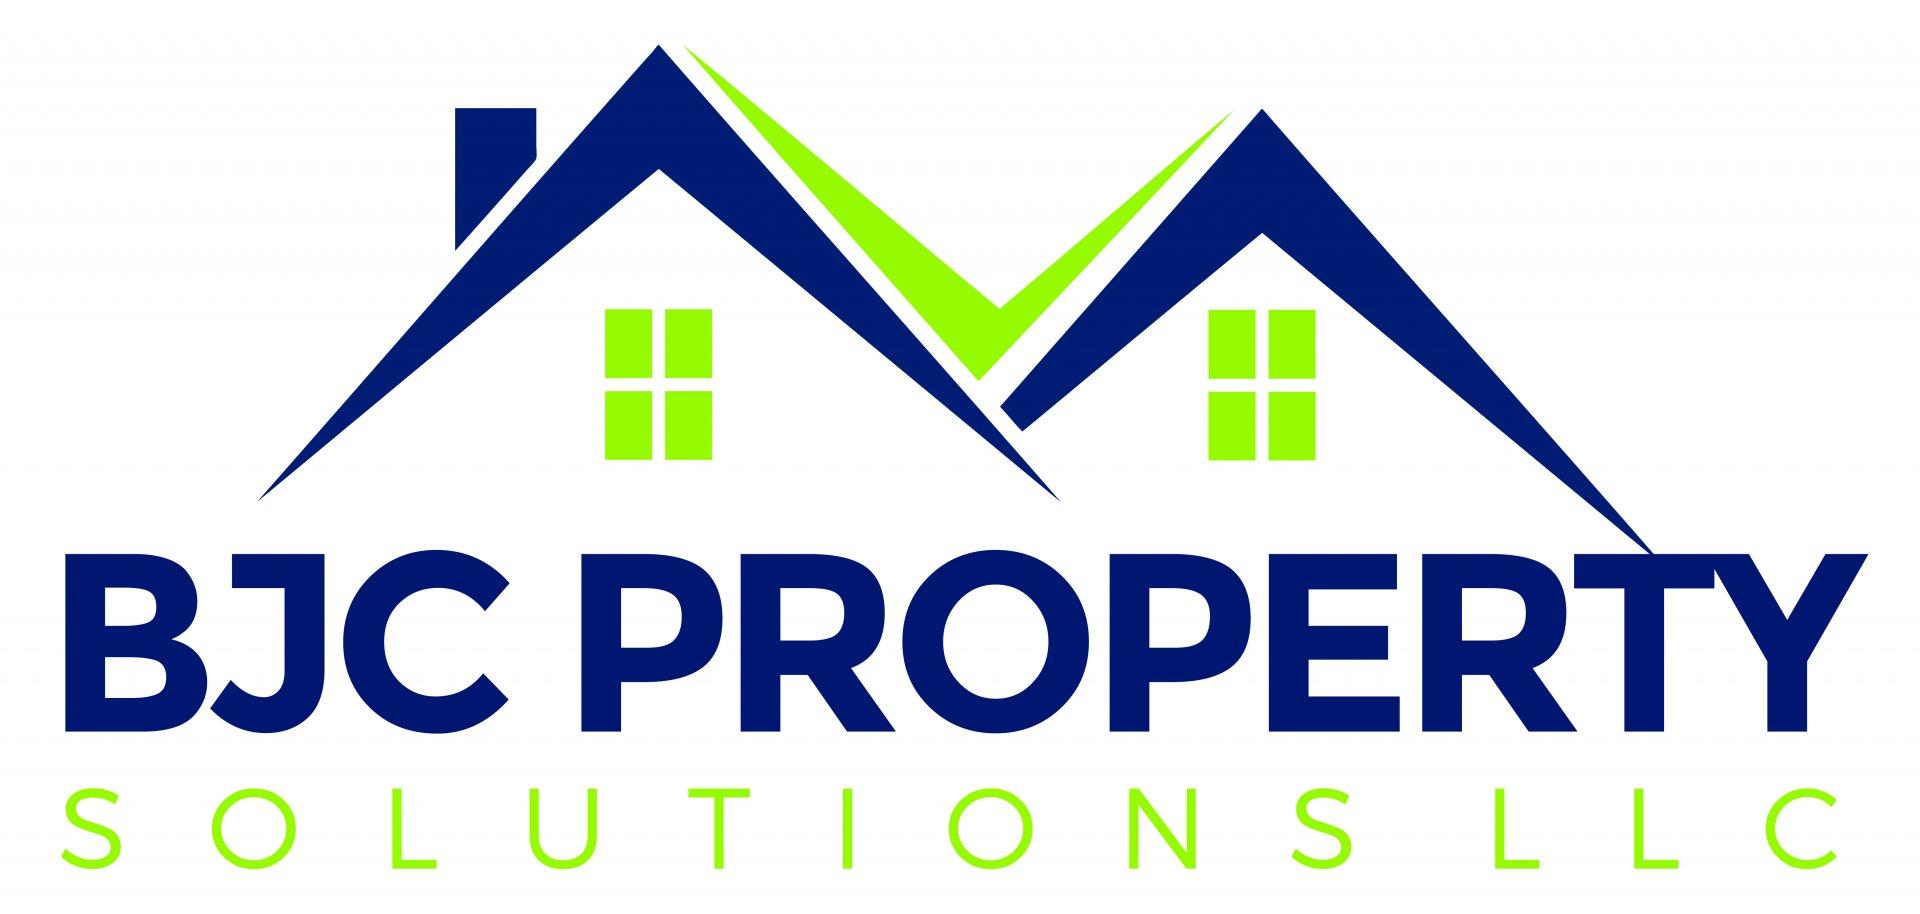 BJC Property Solutions logo